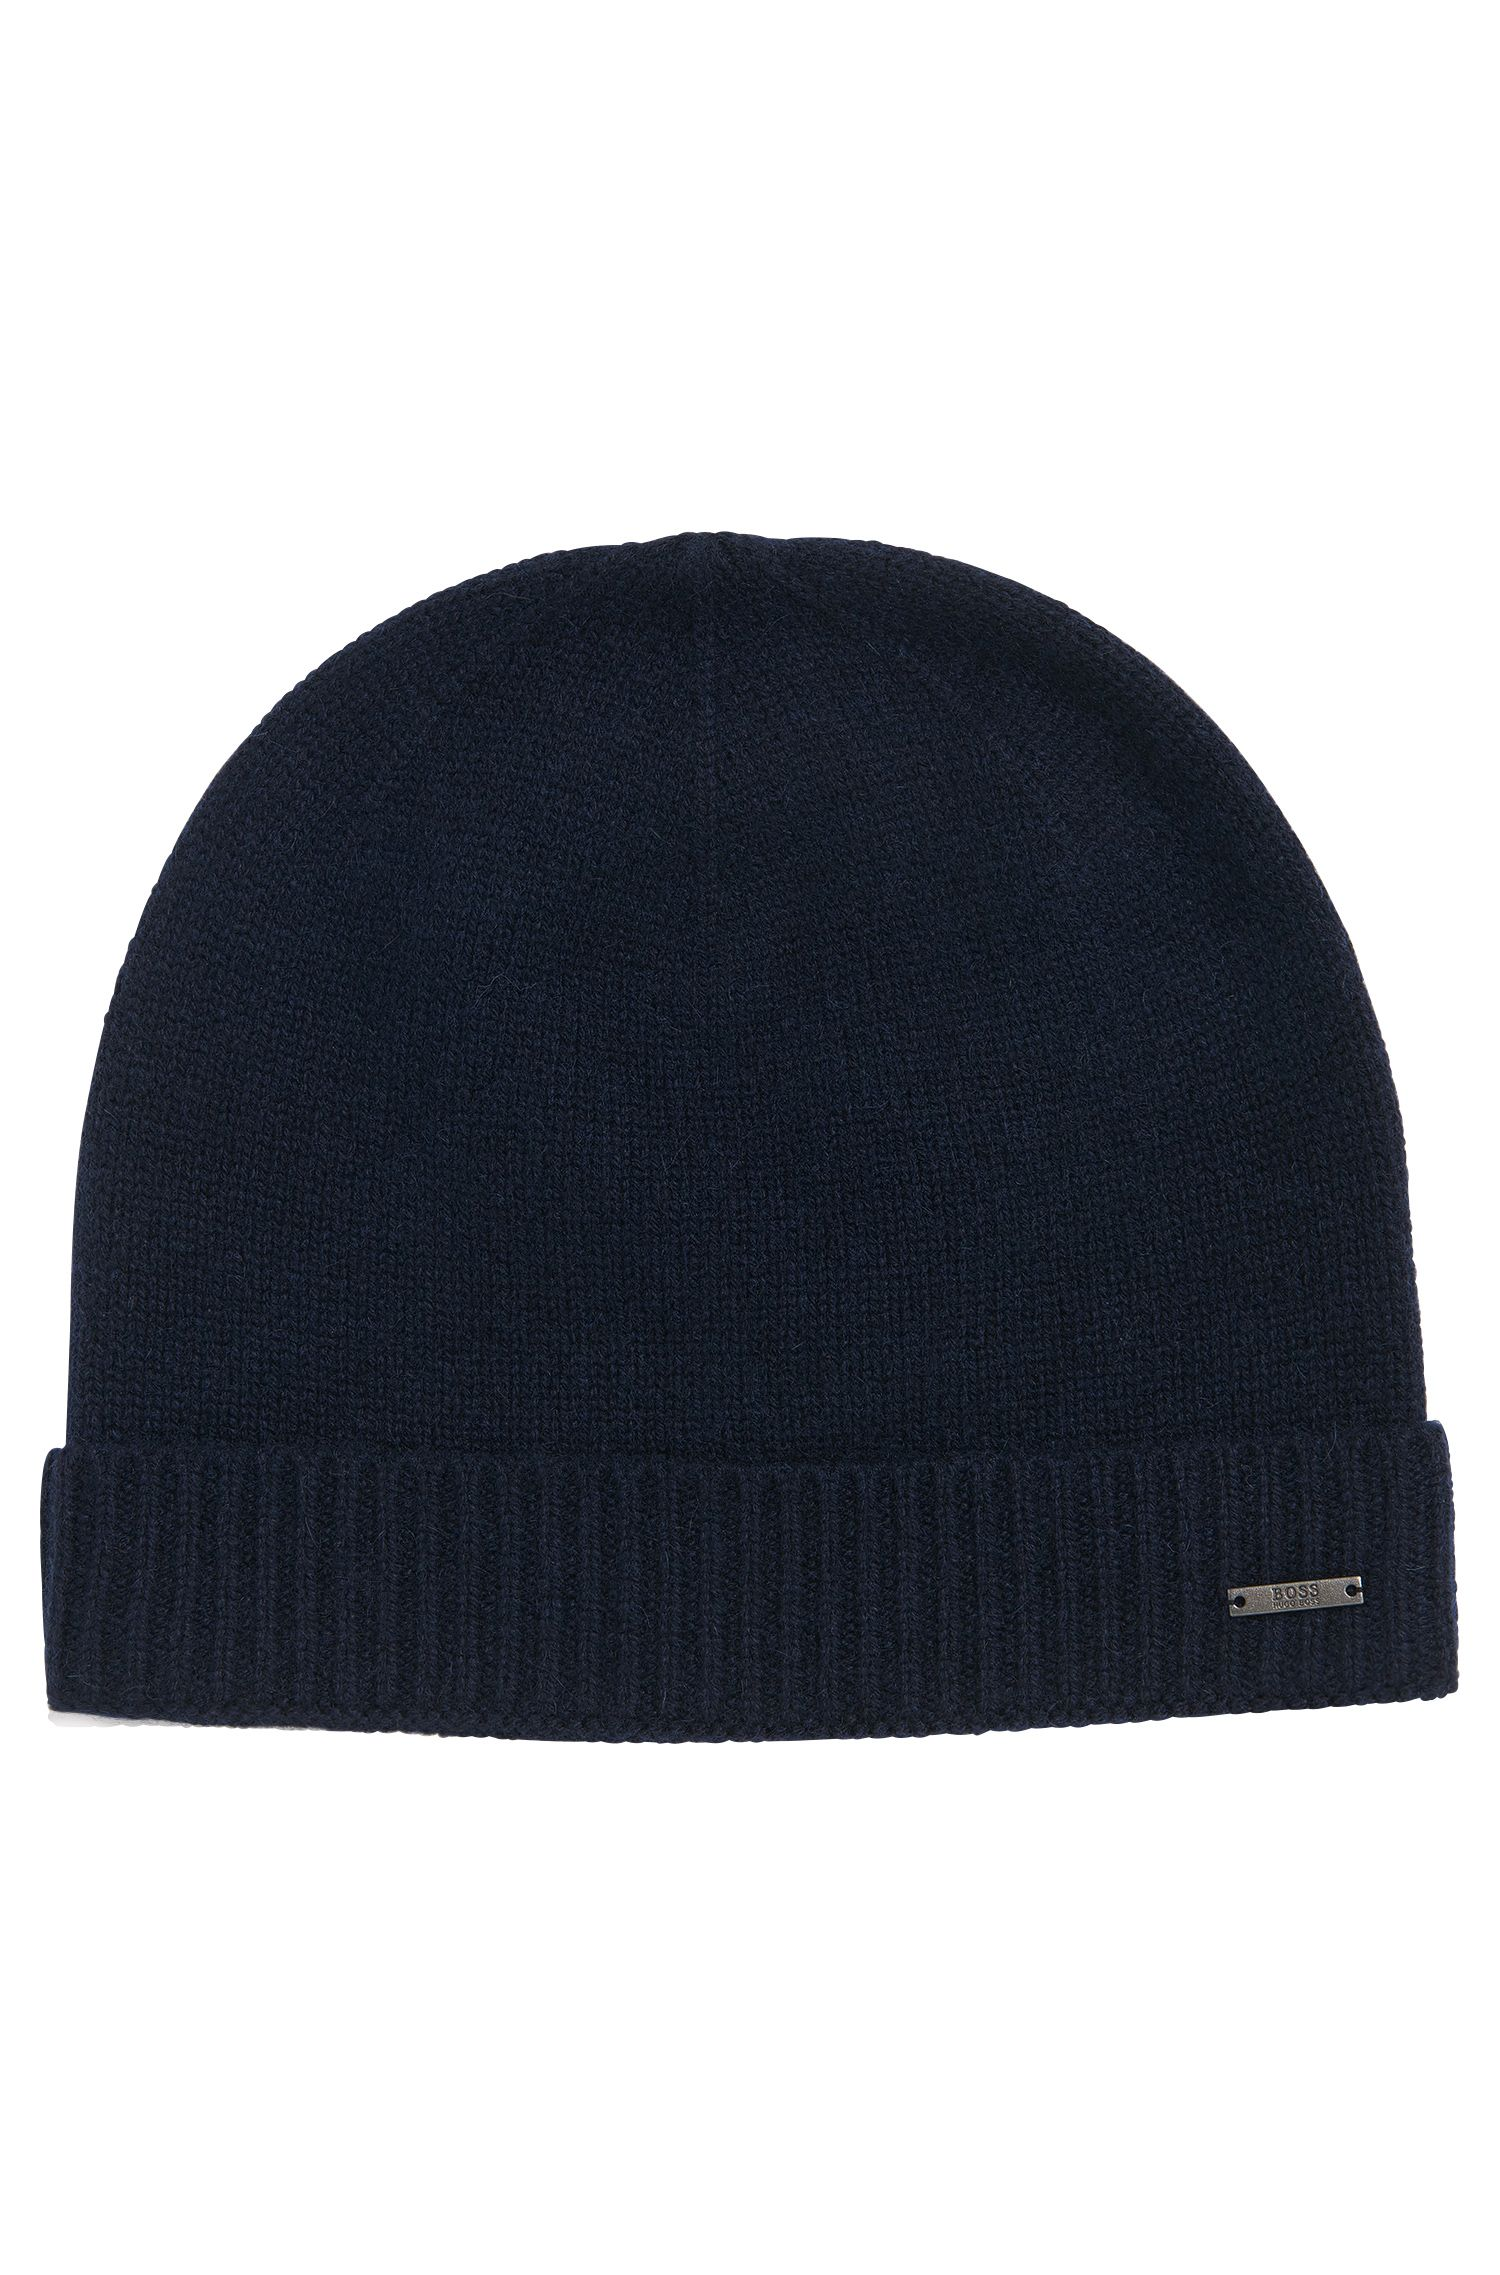 Unifarbene Mütze aus Kaschmir: 'Frolino_D'